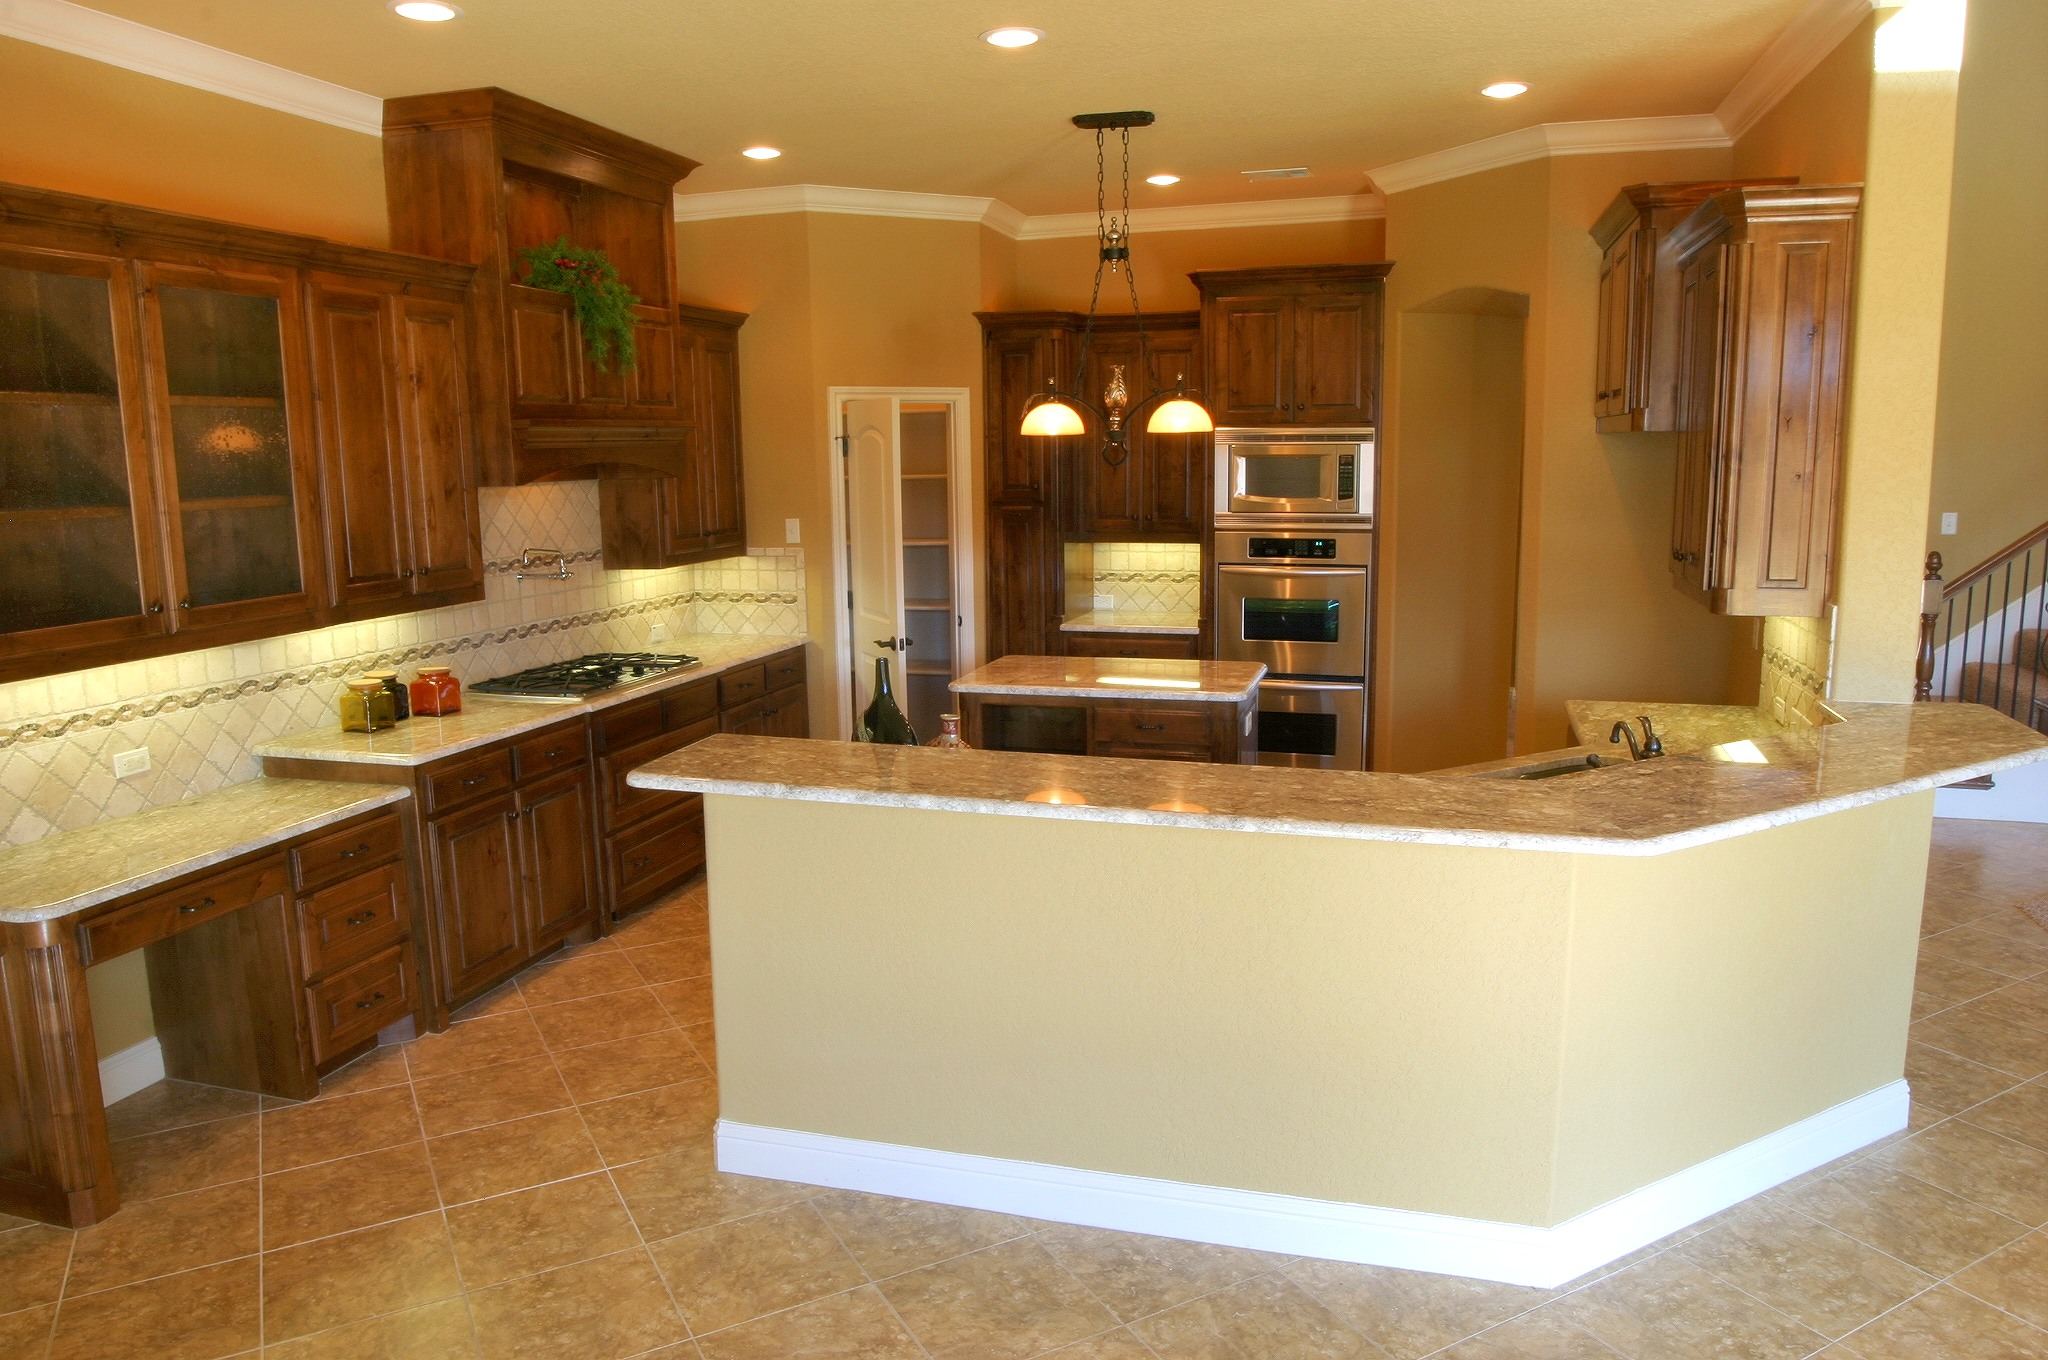 Microwave kitchen cabinet photo - 2